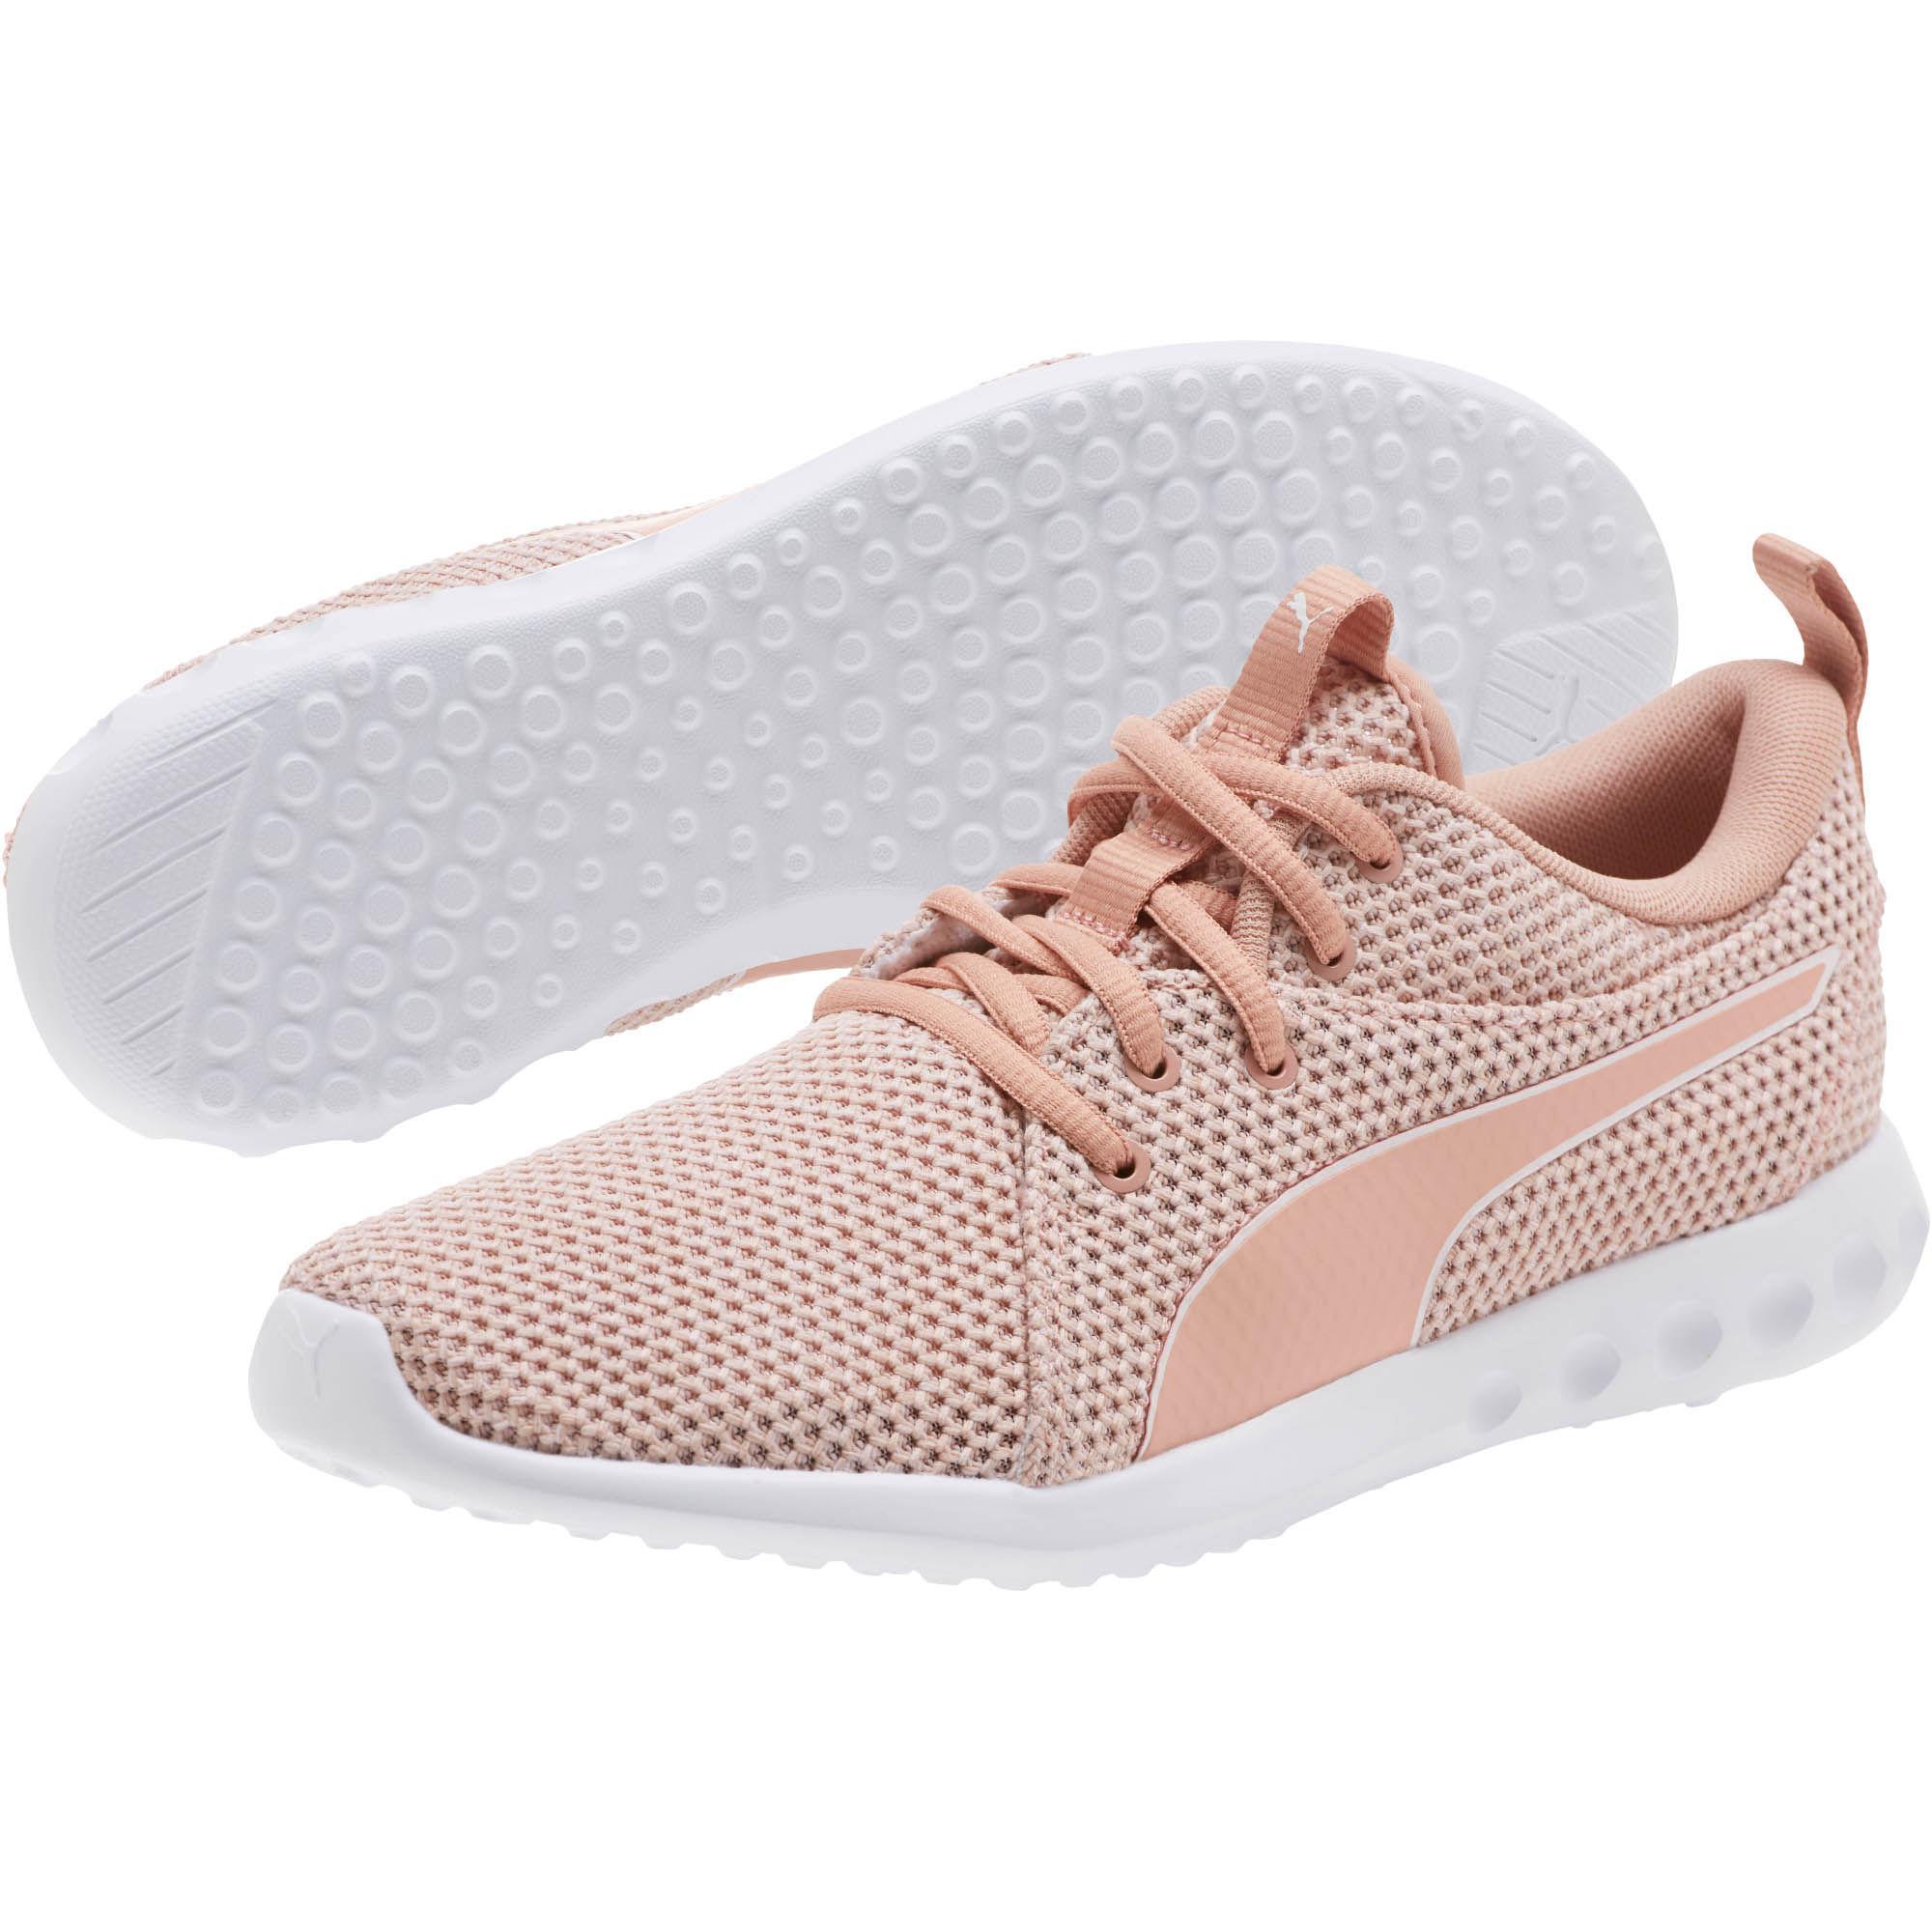 542c1e51566 PUMA - Pink Carson 2 Nature Knit Women s Running Shoes - Lyst. View  fullscreen